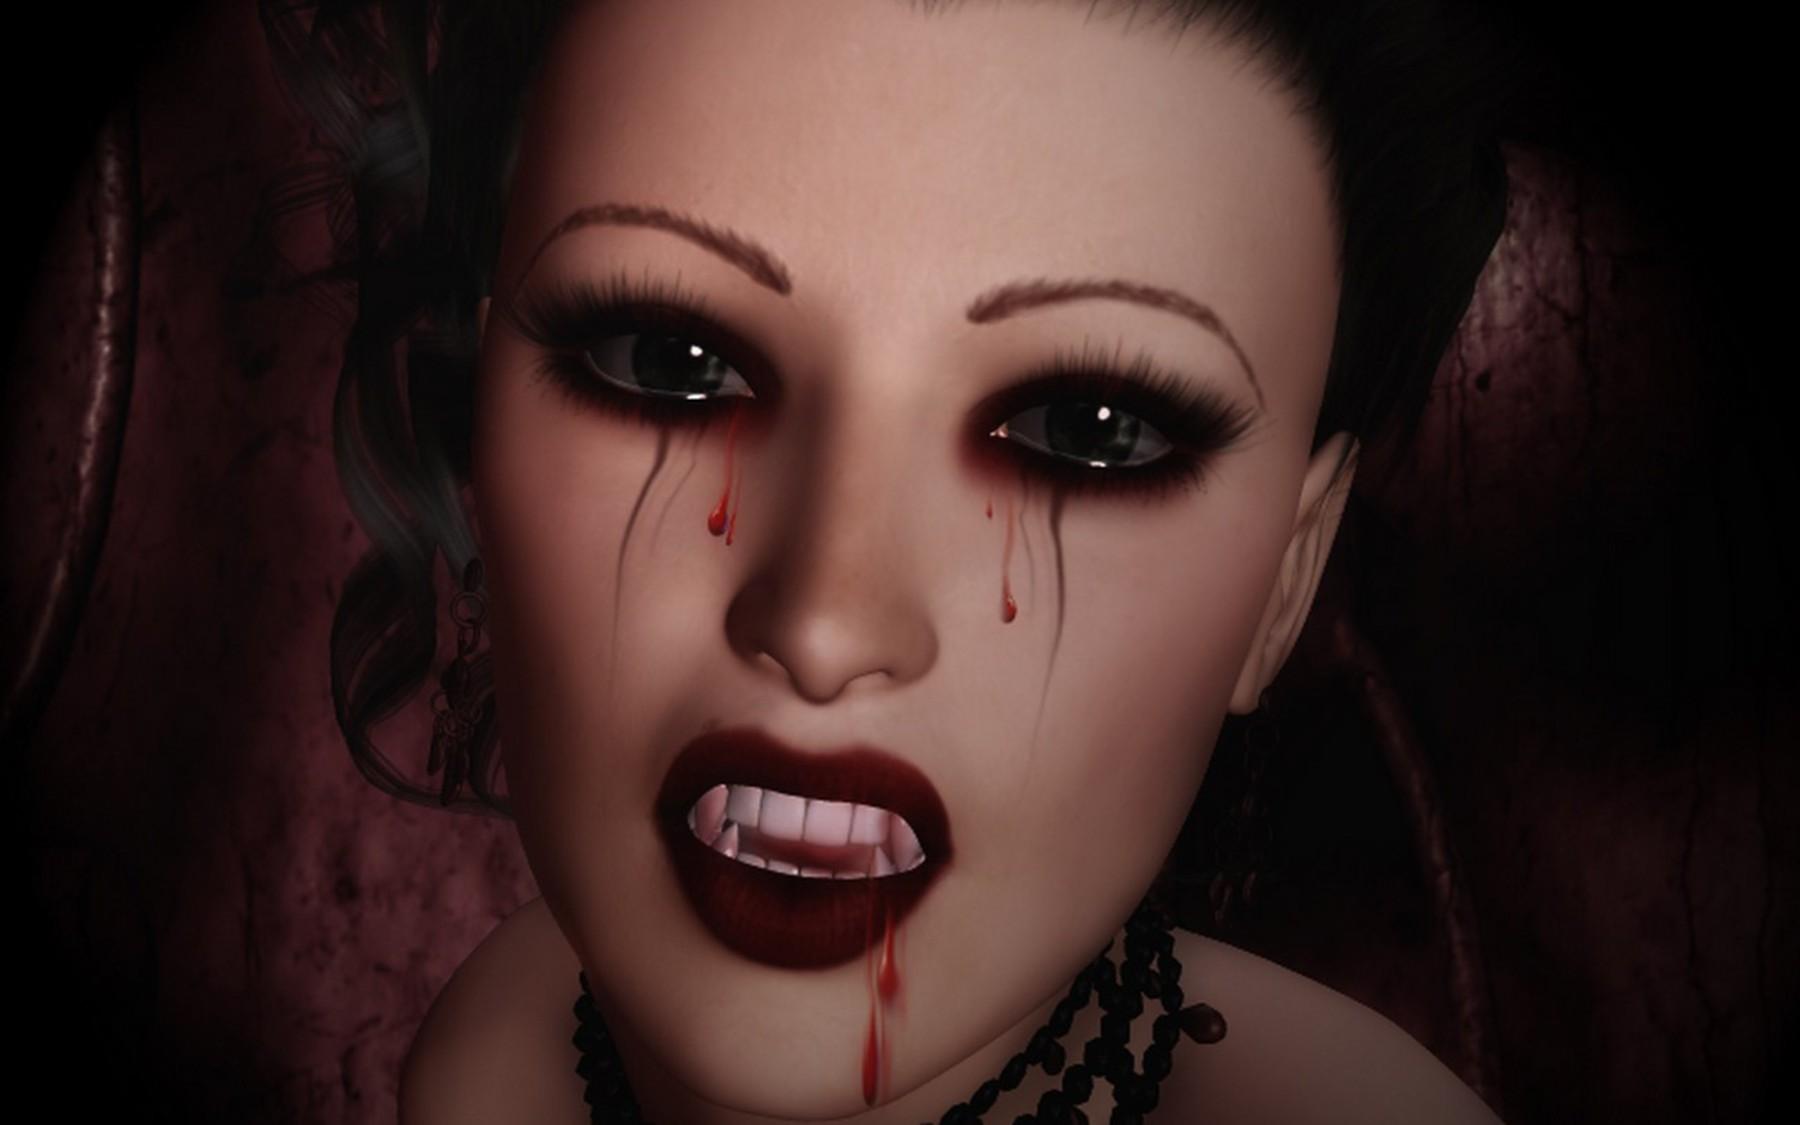 Image 1287890805 1800x1125 scary vire girl viraamericana